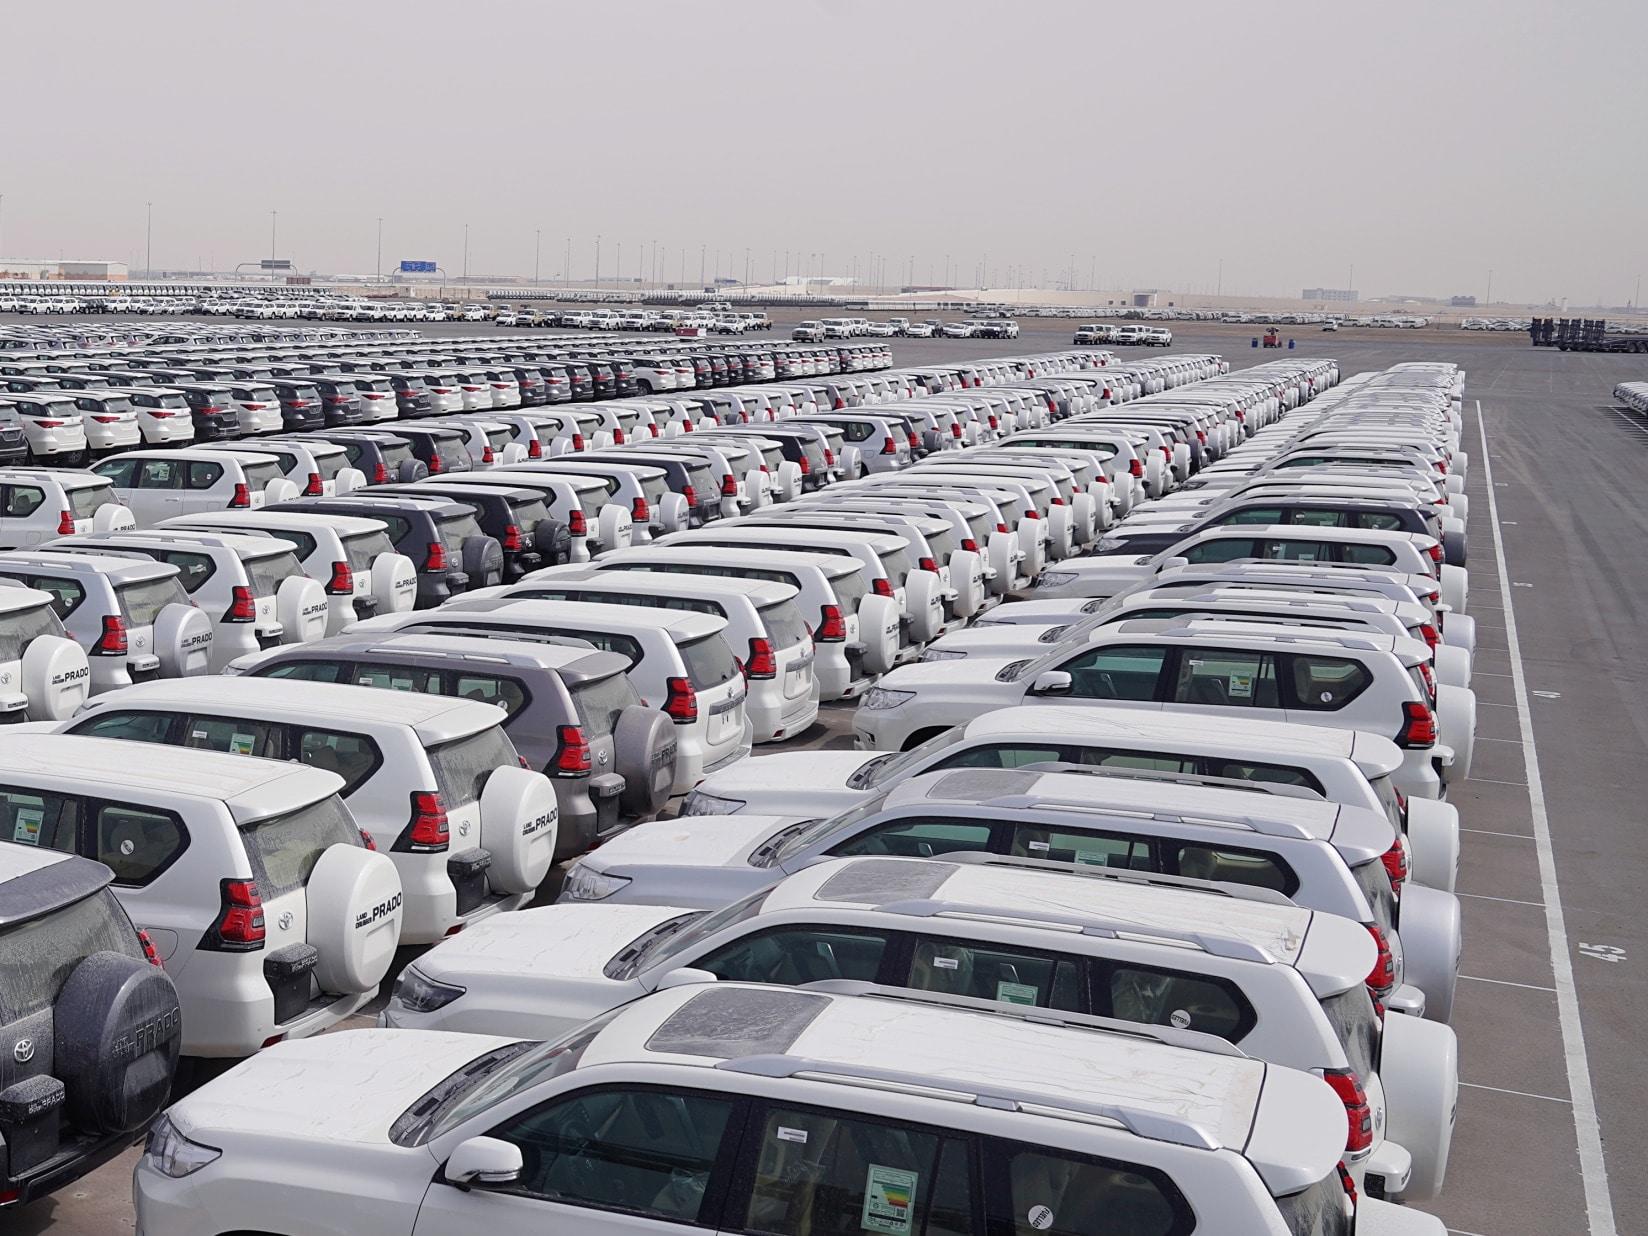 Dubai Auto Zone, Freezones in Dubai